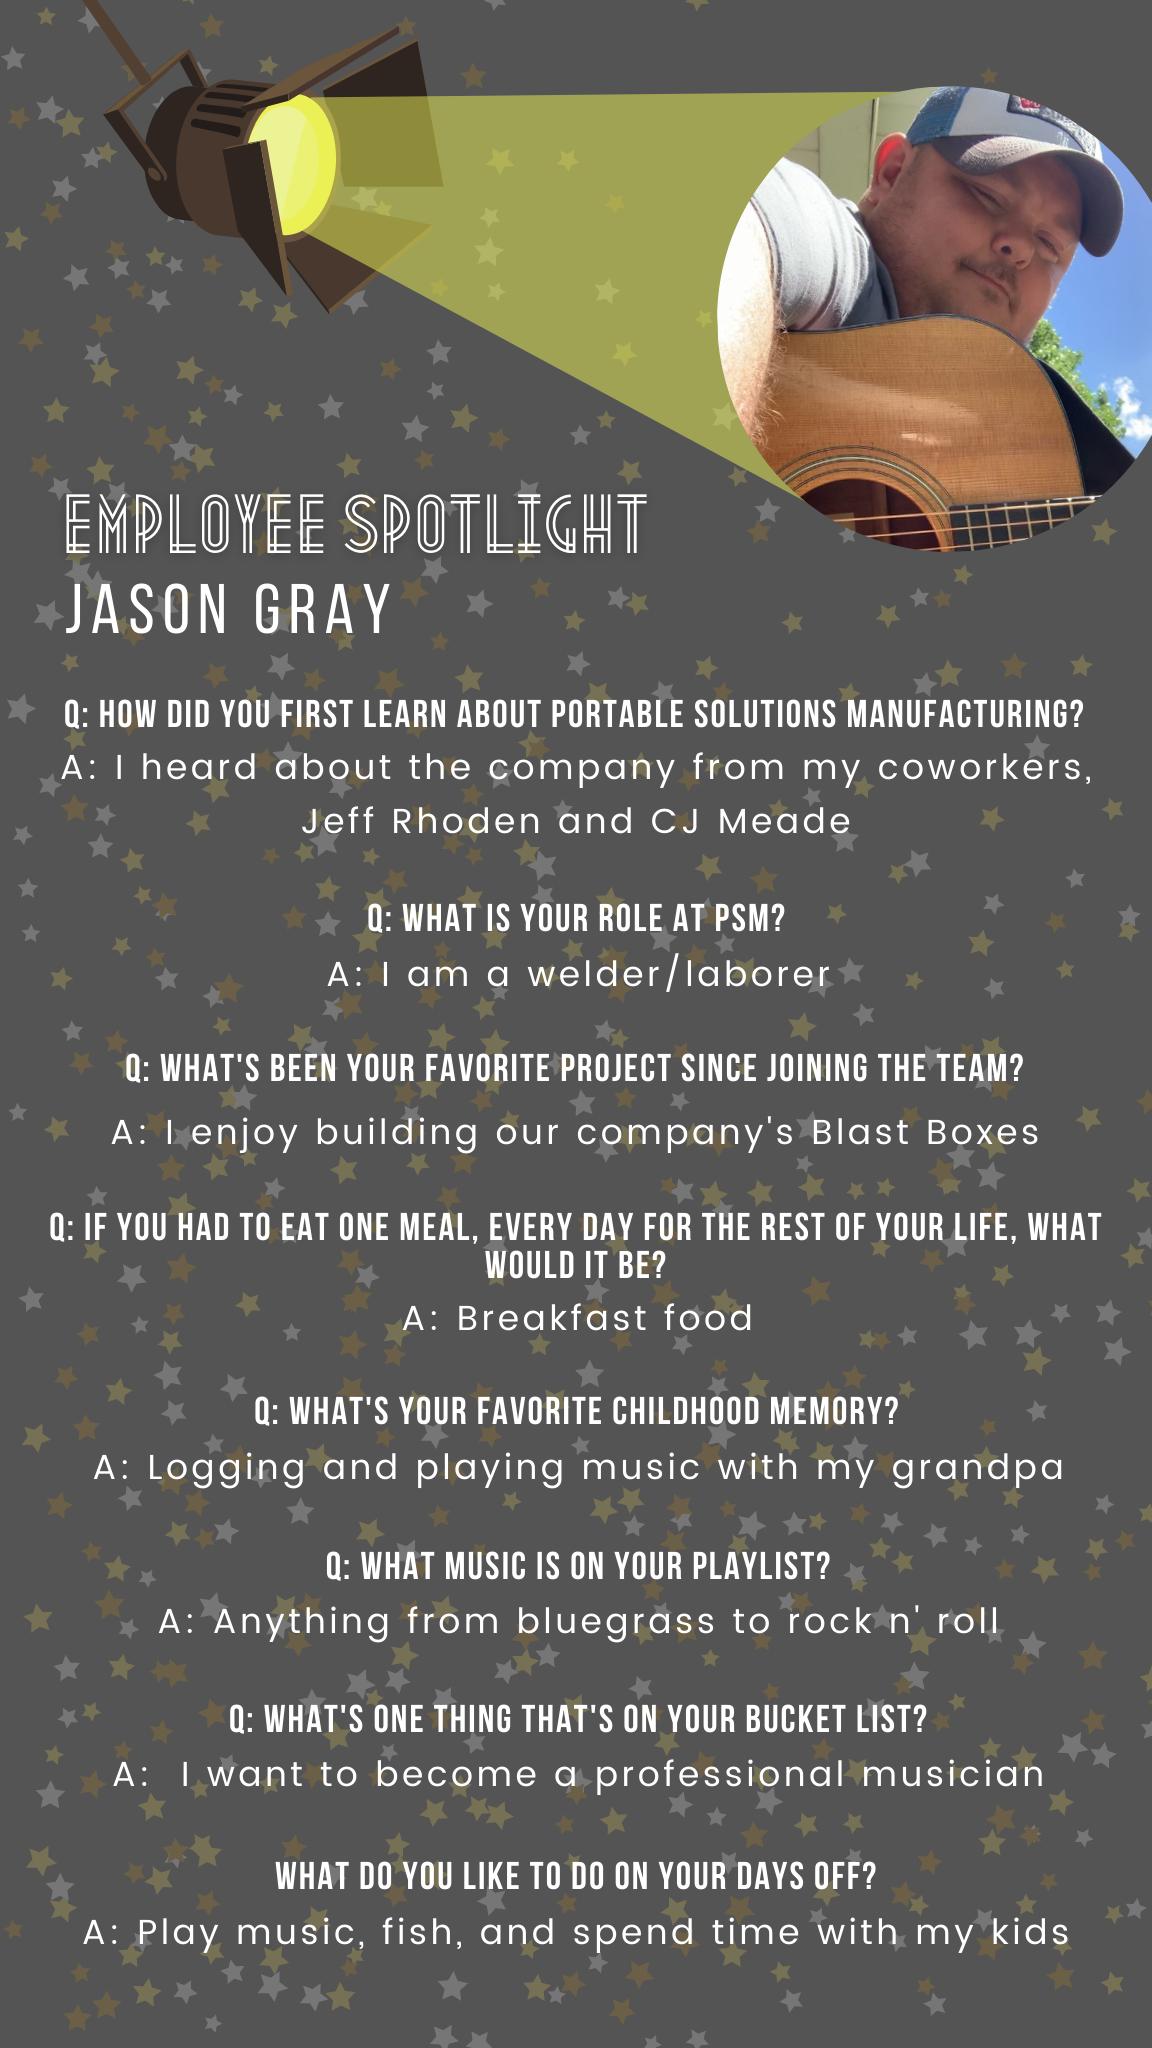 work family, team, employee engagement, employee appreciation, company culture, Employee Spotlight, employee experience, work culture, teamwork, workplace culture